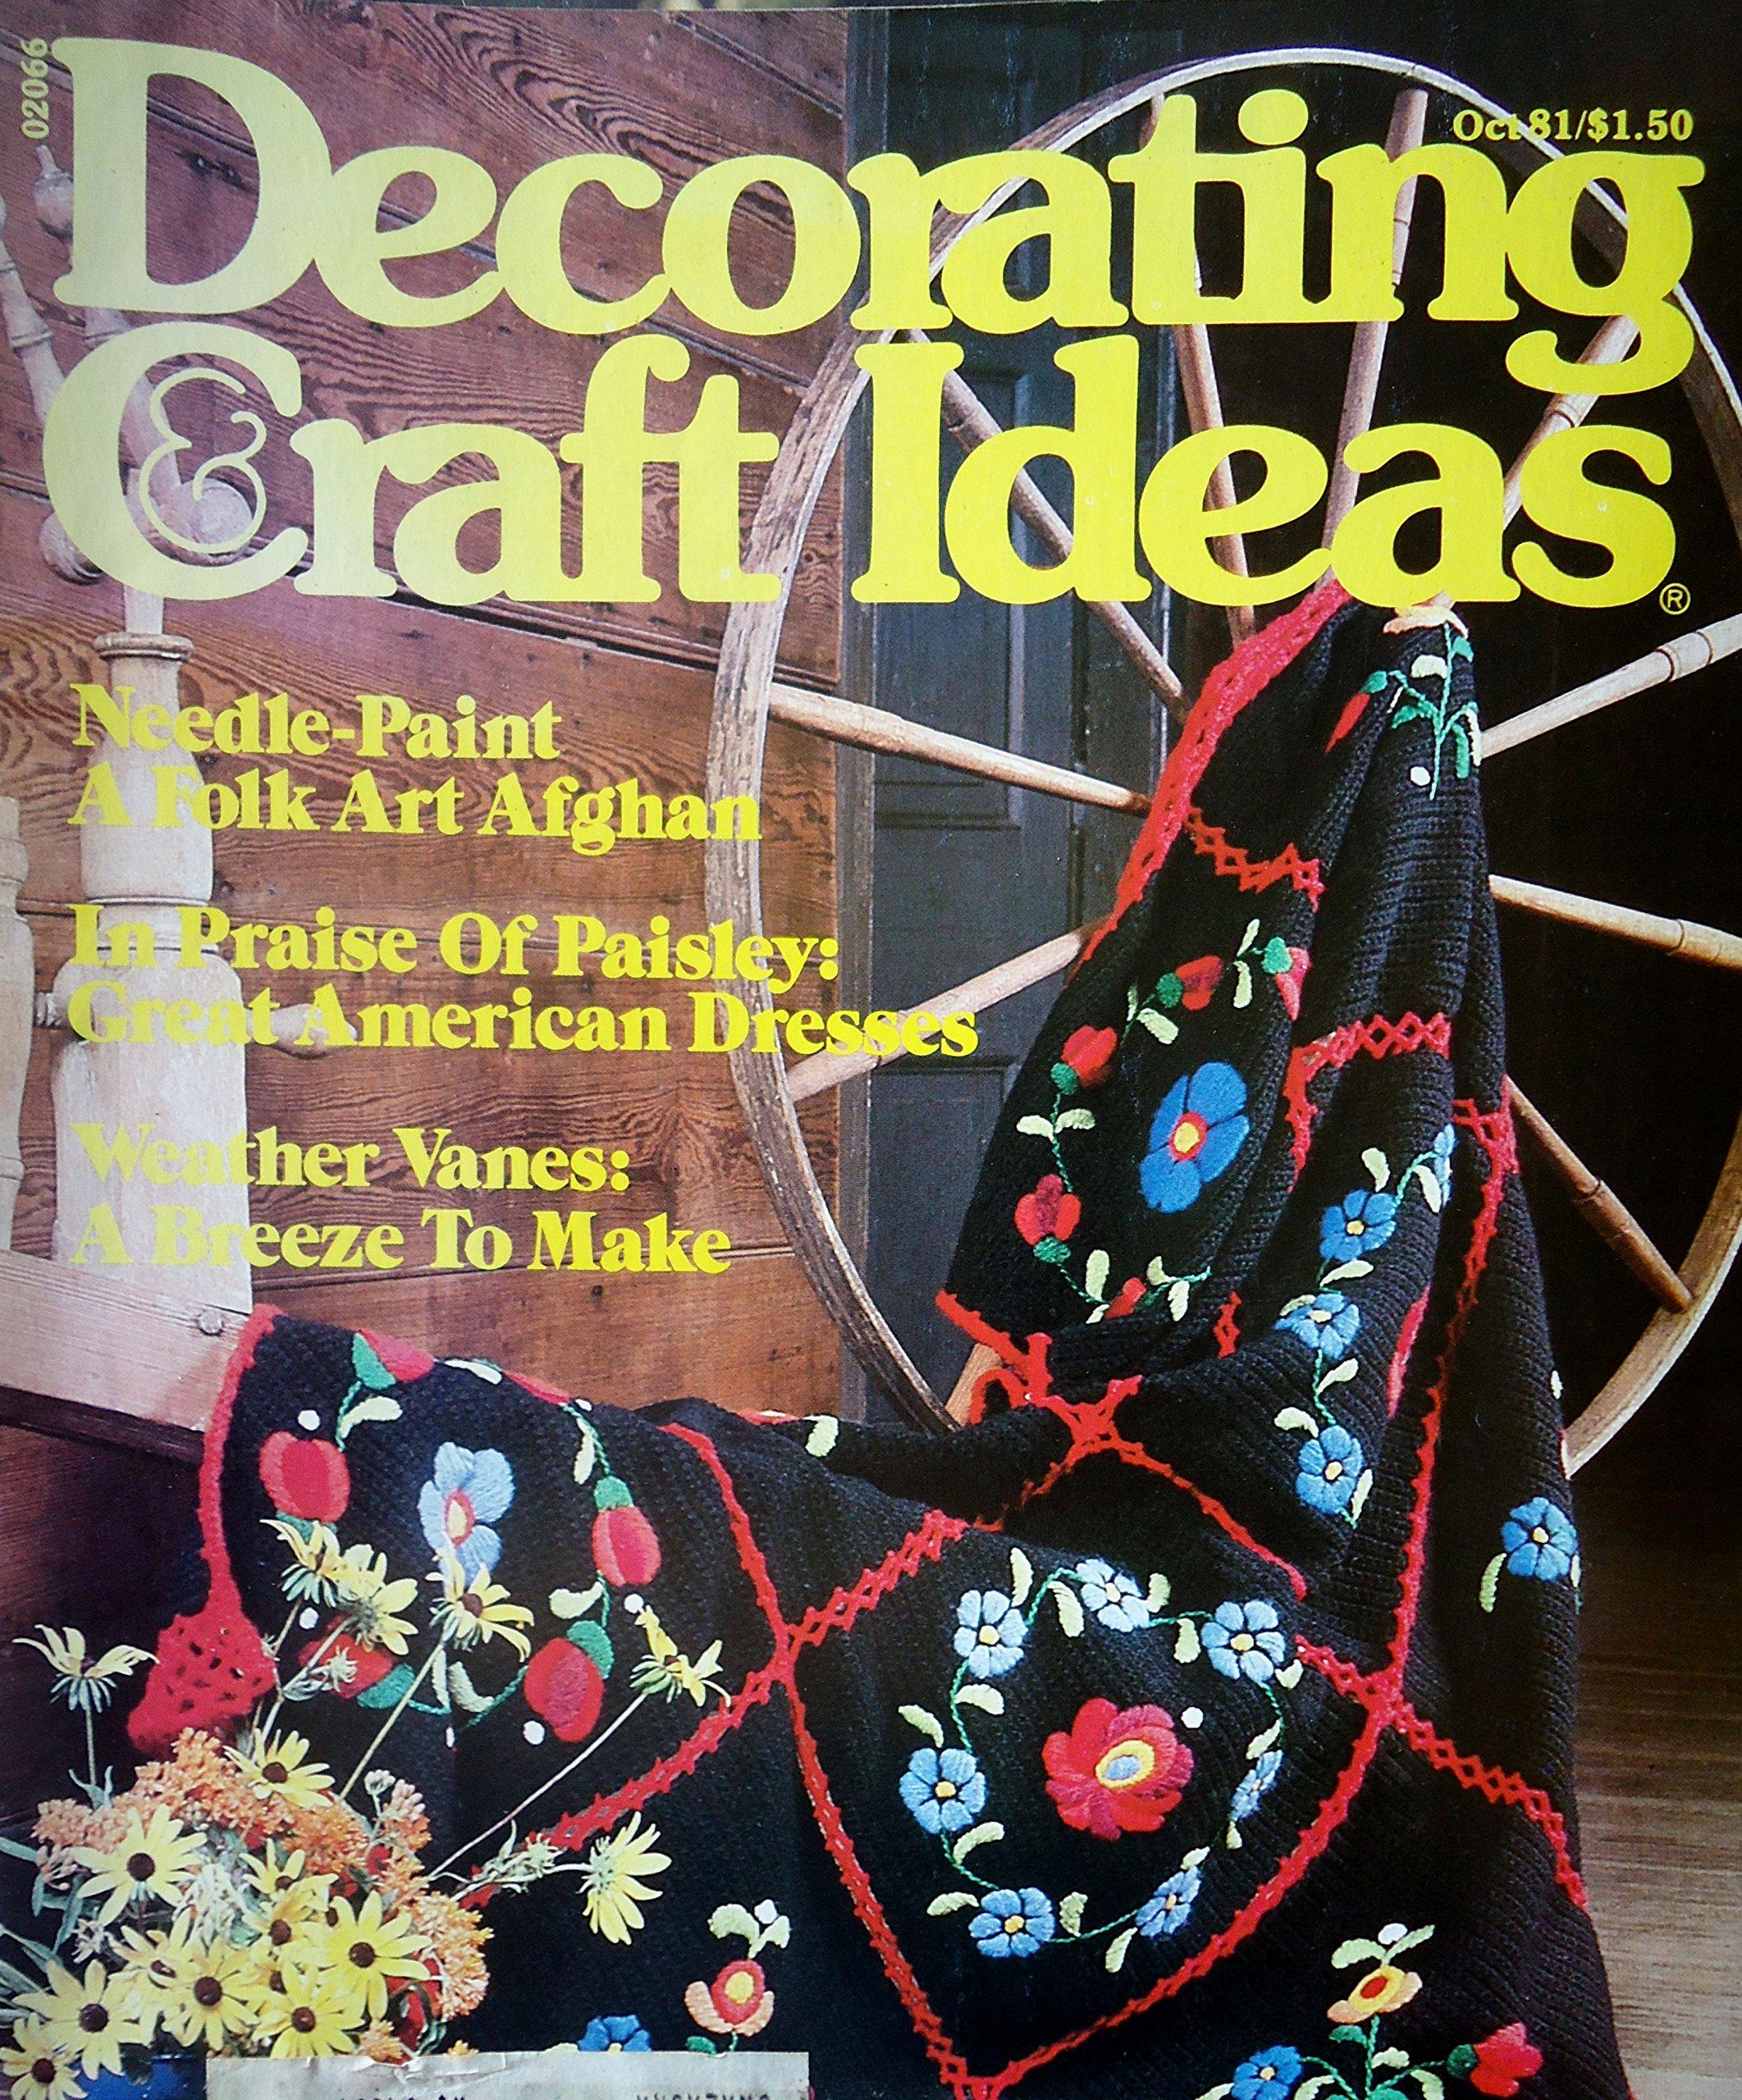 Decorating Craft Ideas Magazine October 1981 Amazon Com Books